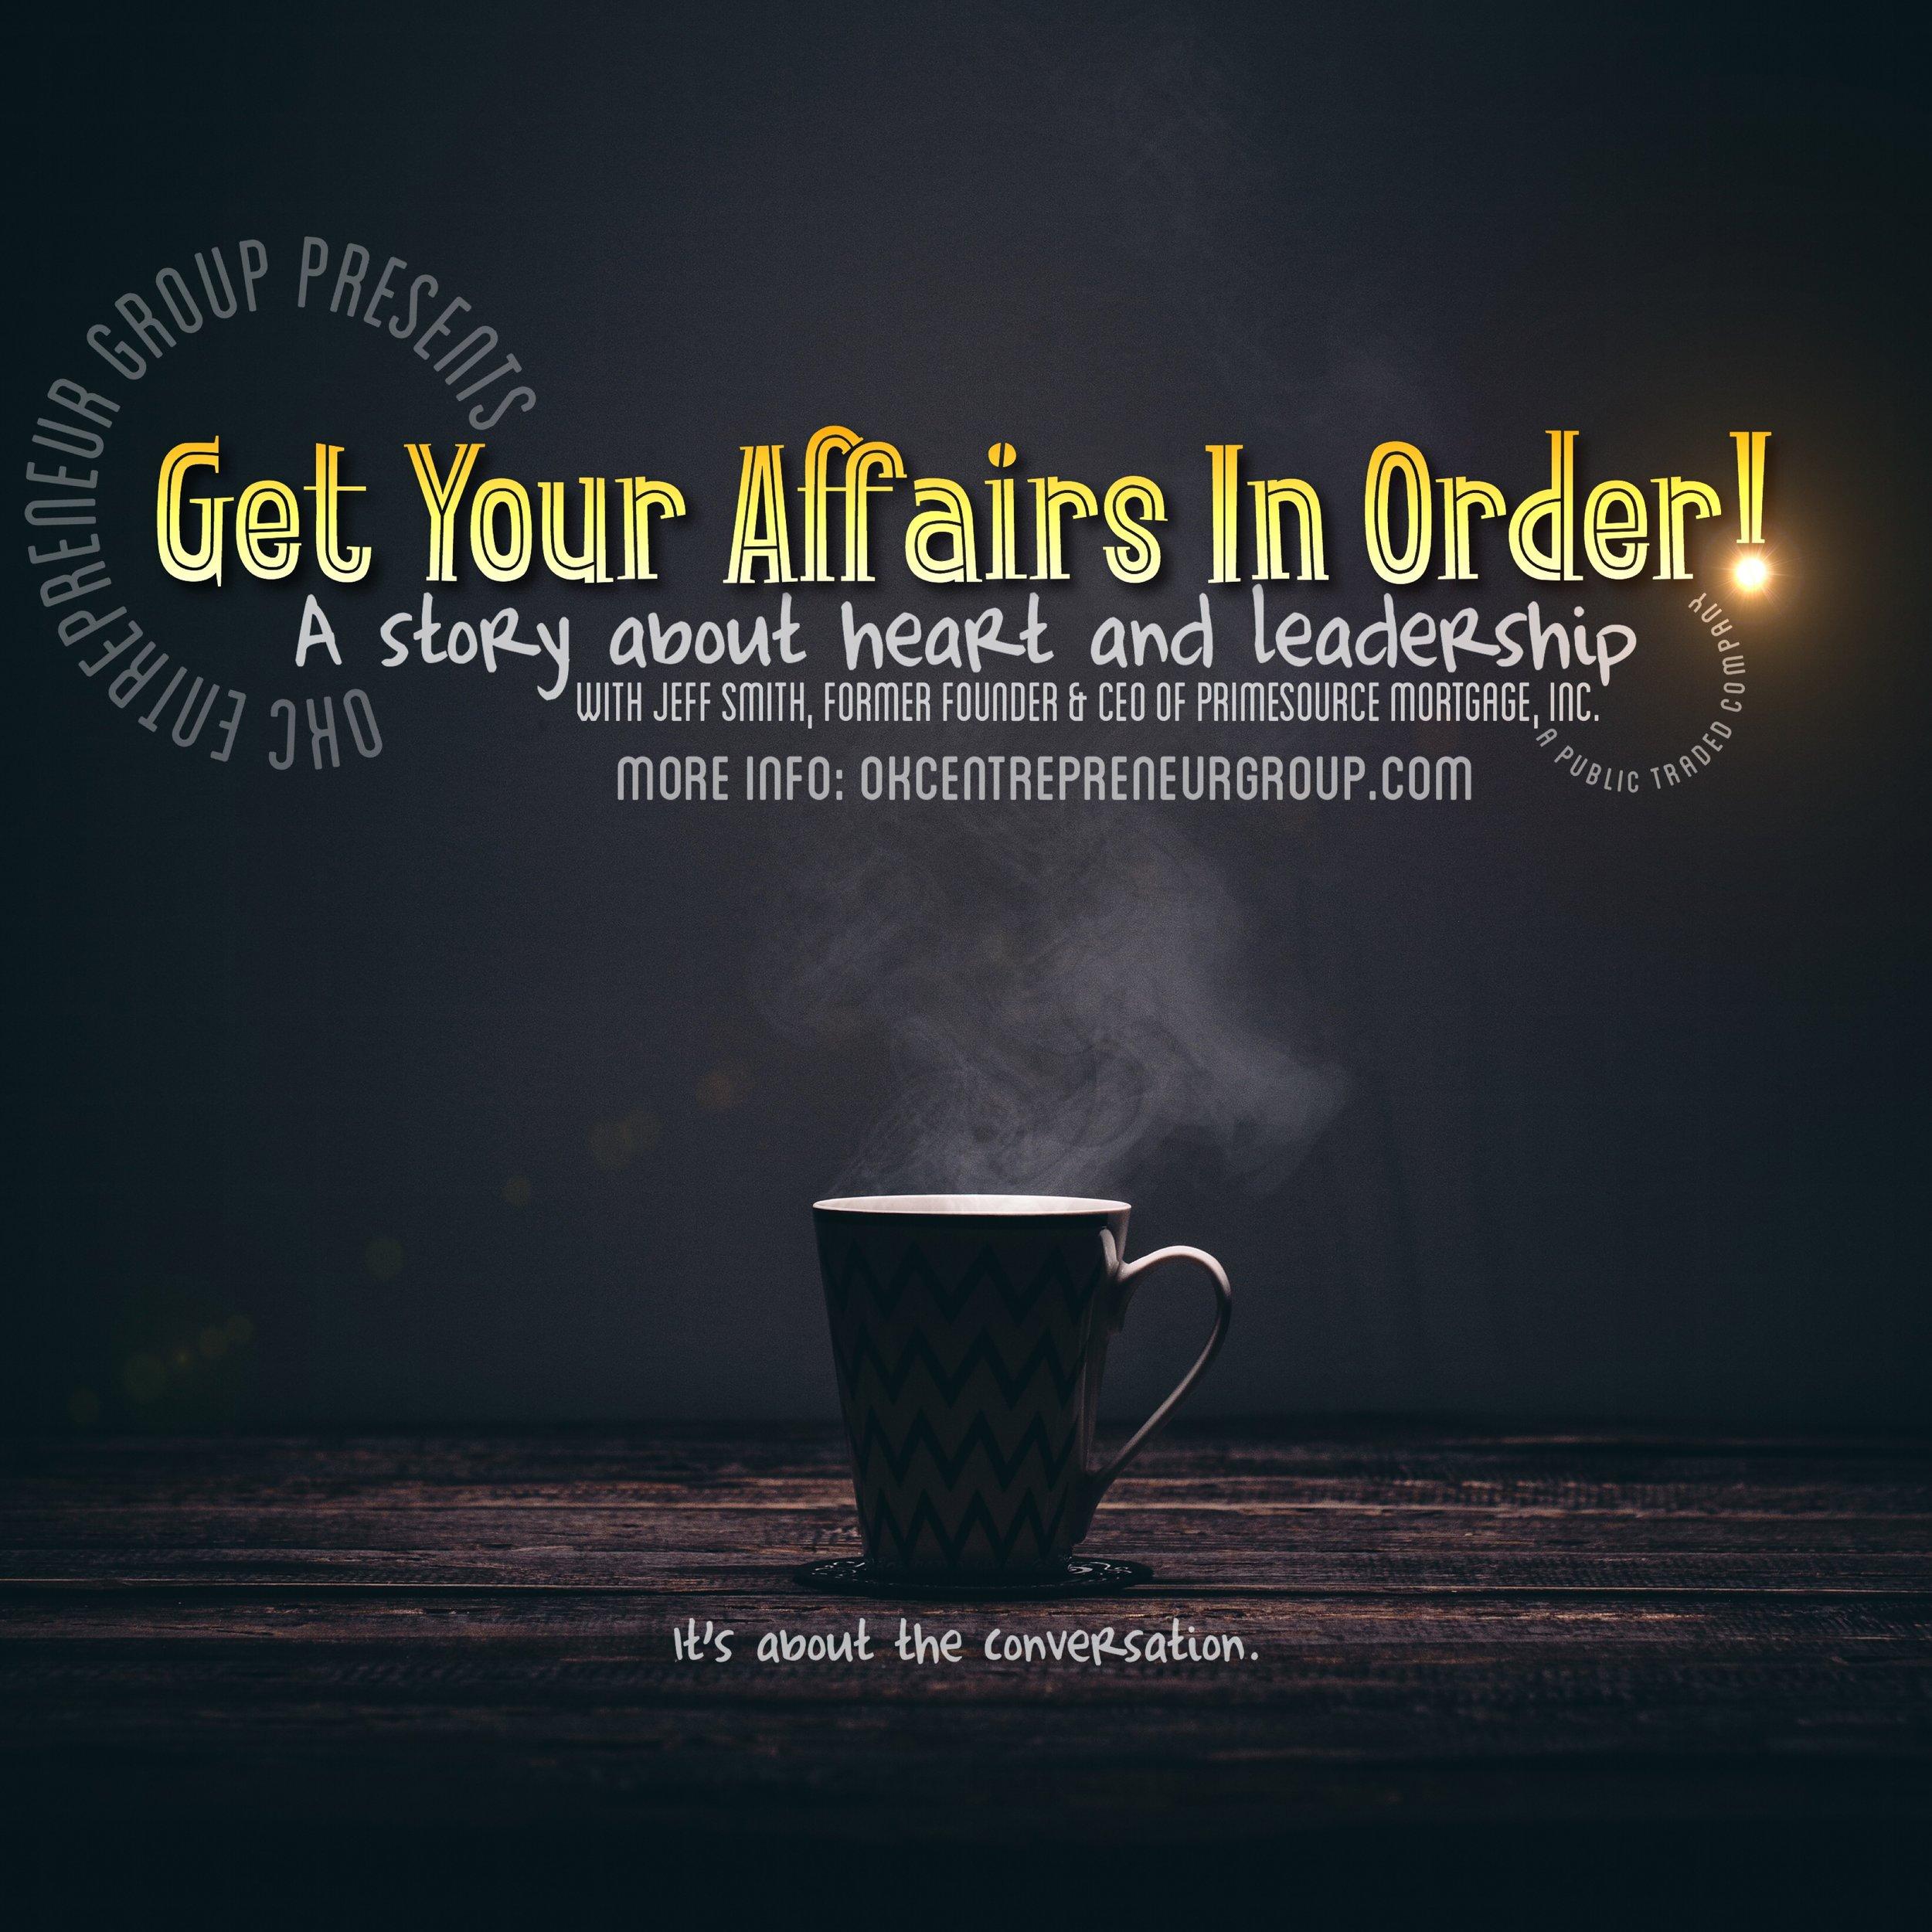 Get Your Affairs in Order sm #okceg.jpg